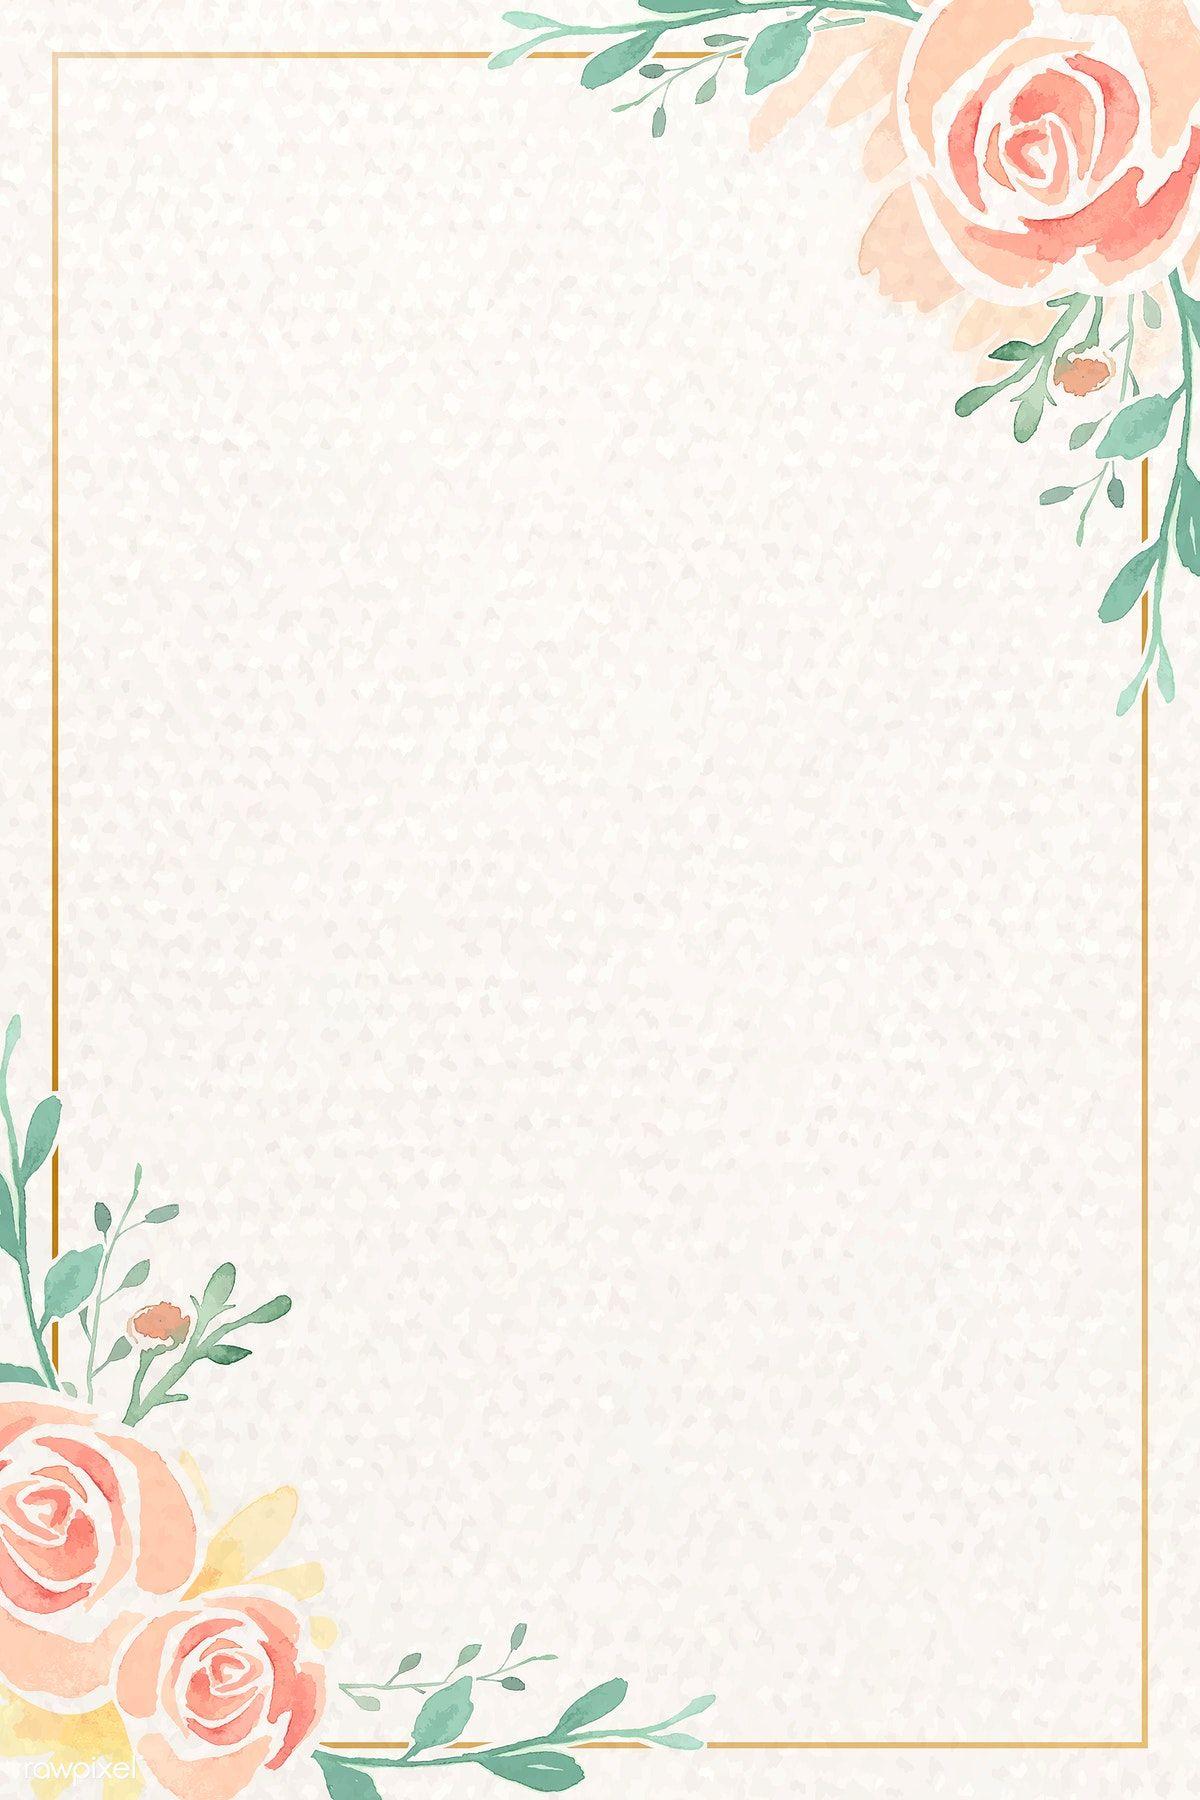 Download Premium Vector Of Vintage Watercolor Rose Themed Card Template Watercolor Rose Rose Frame Flower Illustration